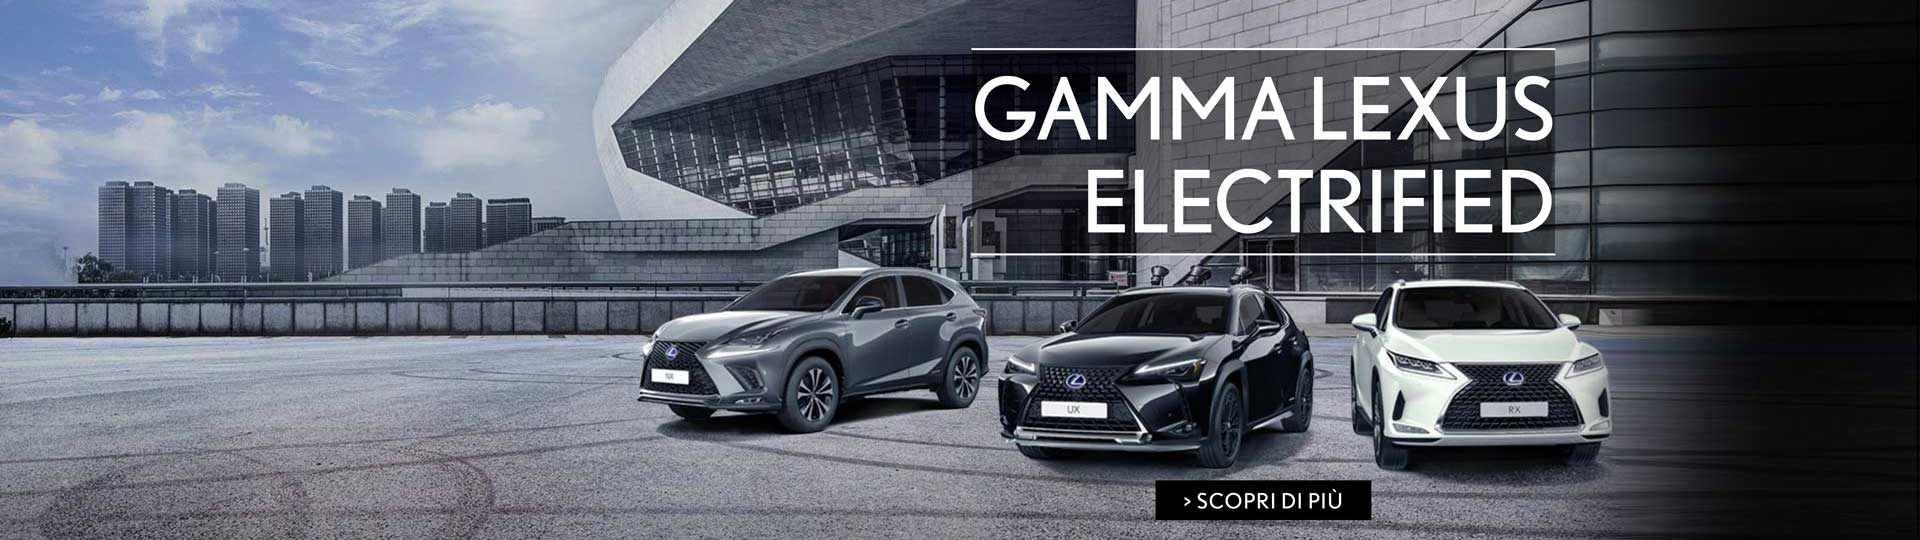 Lexus-Gamma-Electrified-min.jpg